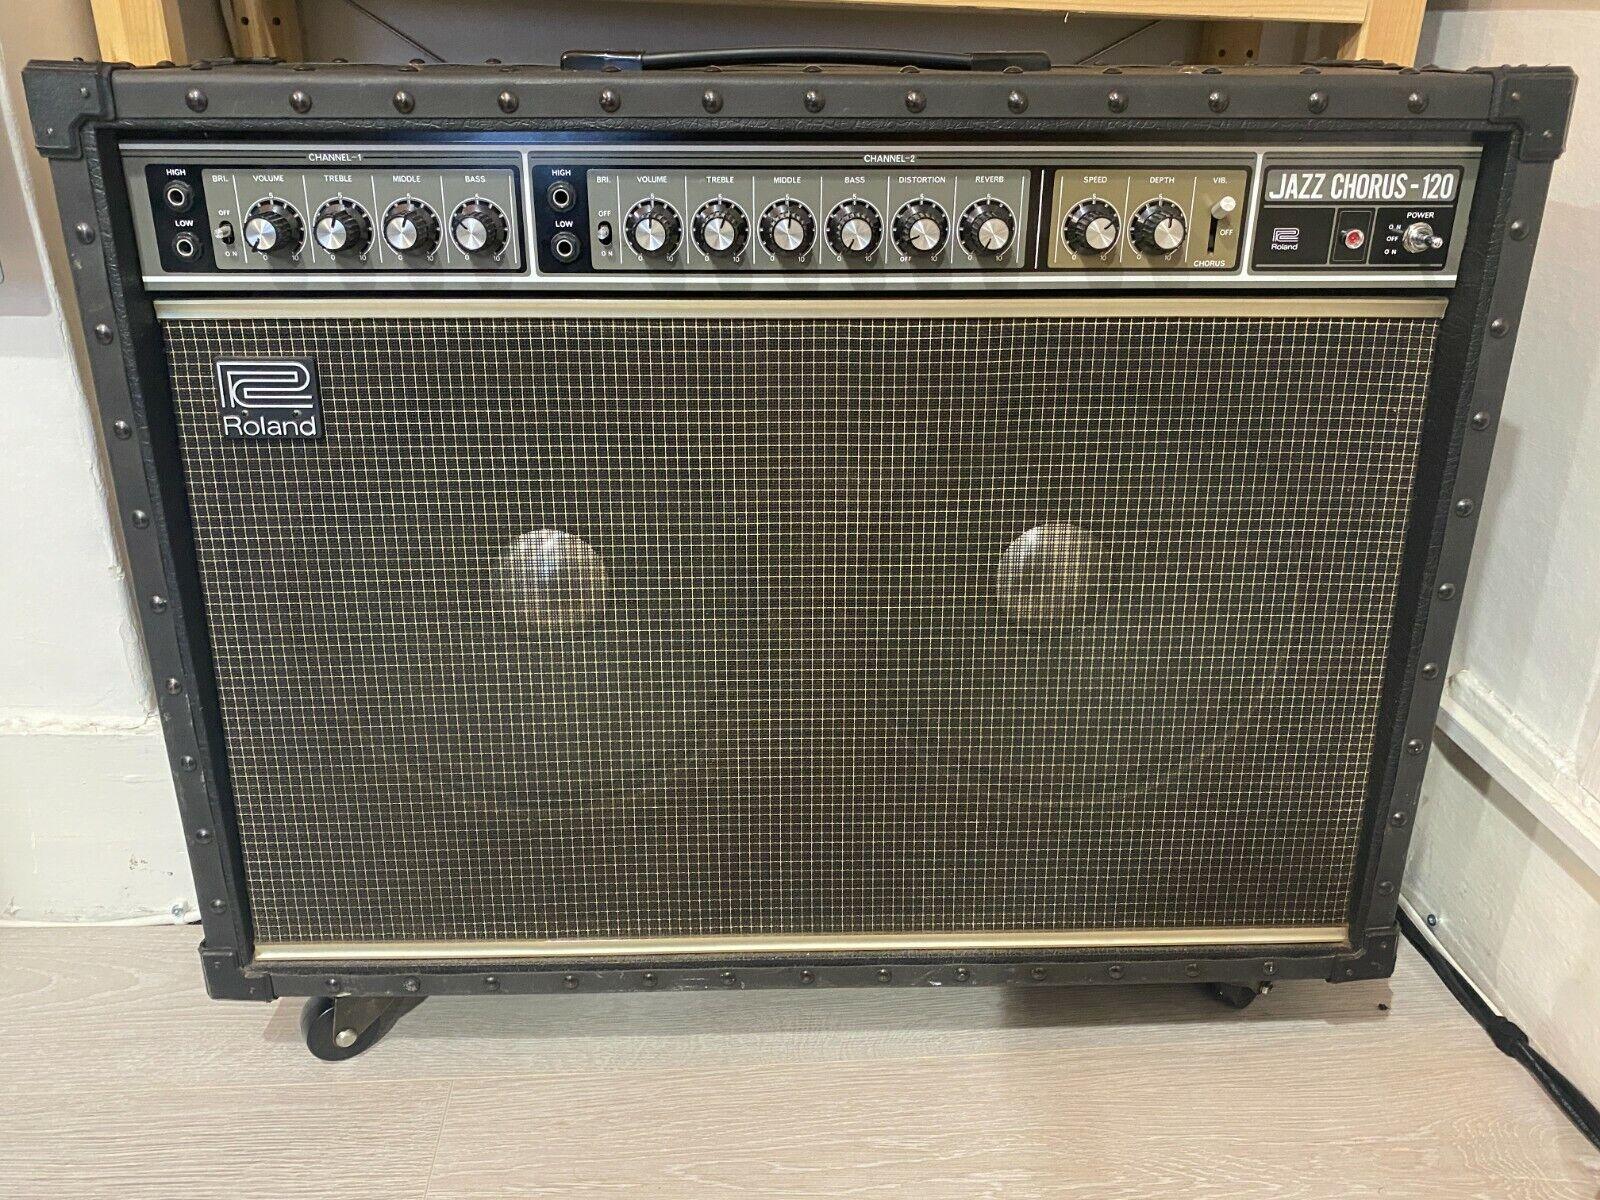 VINTAGE Roland Jazz Chorus JC 120 2x12 Guitar Amplifier Combo 1980